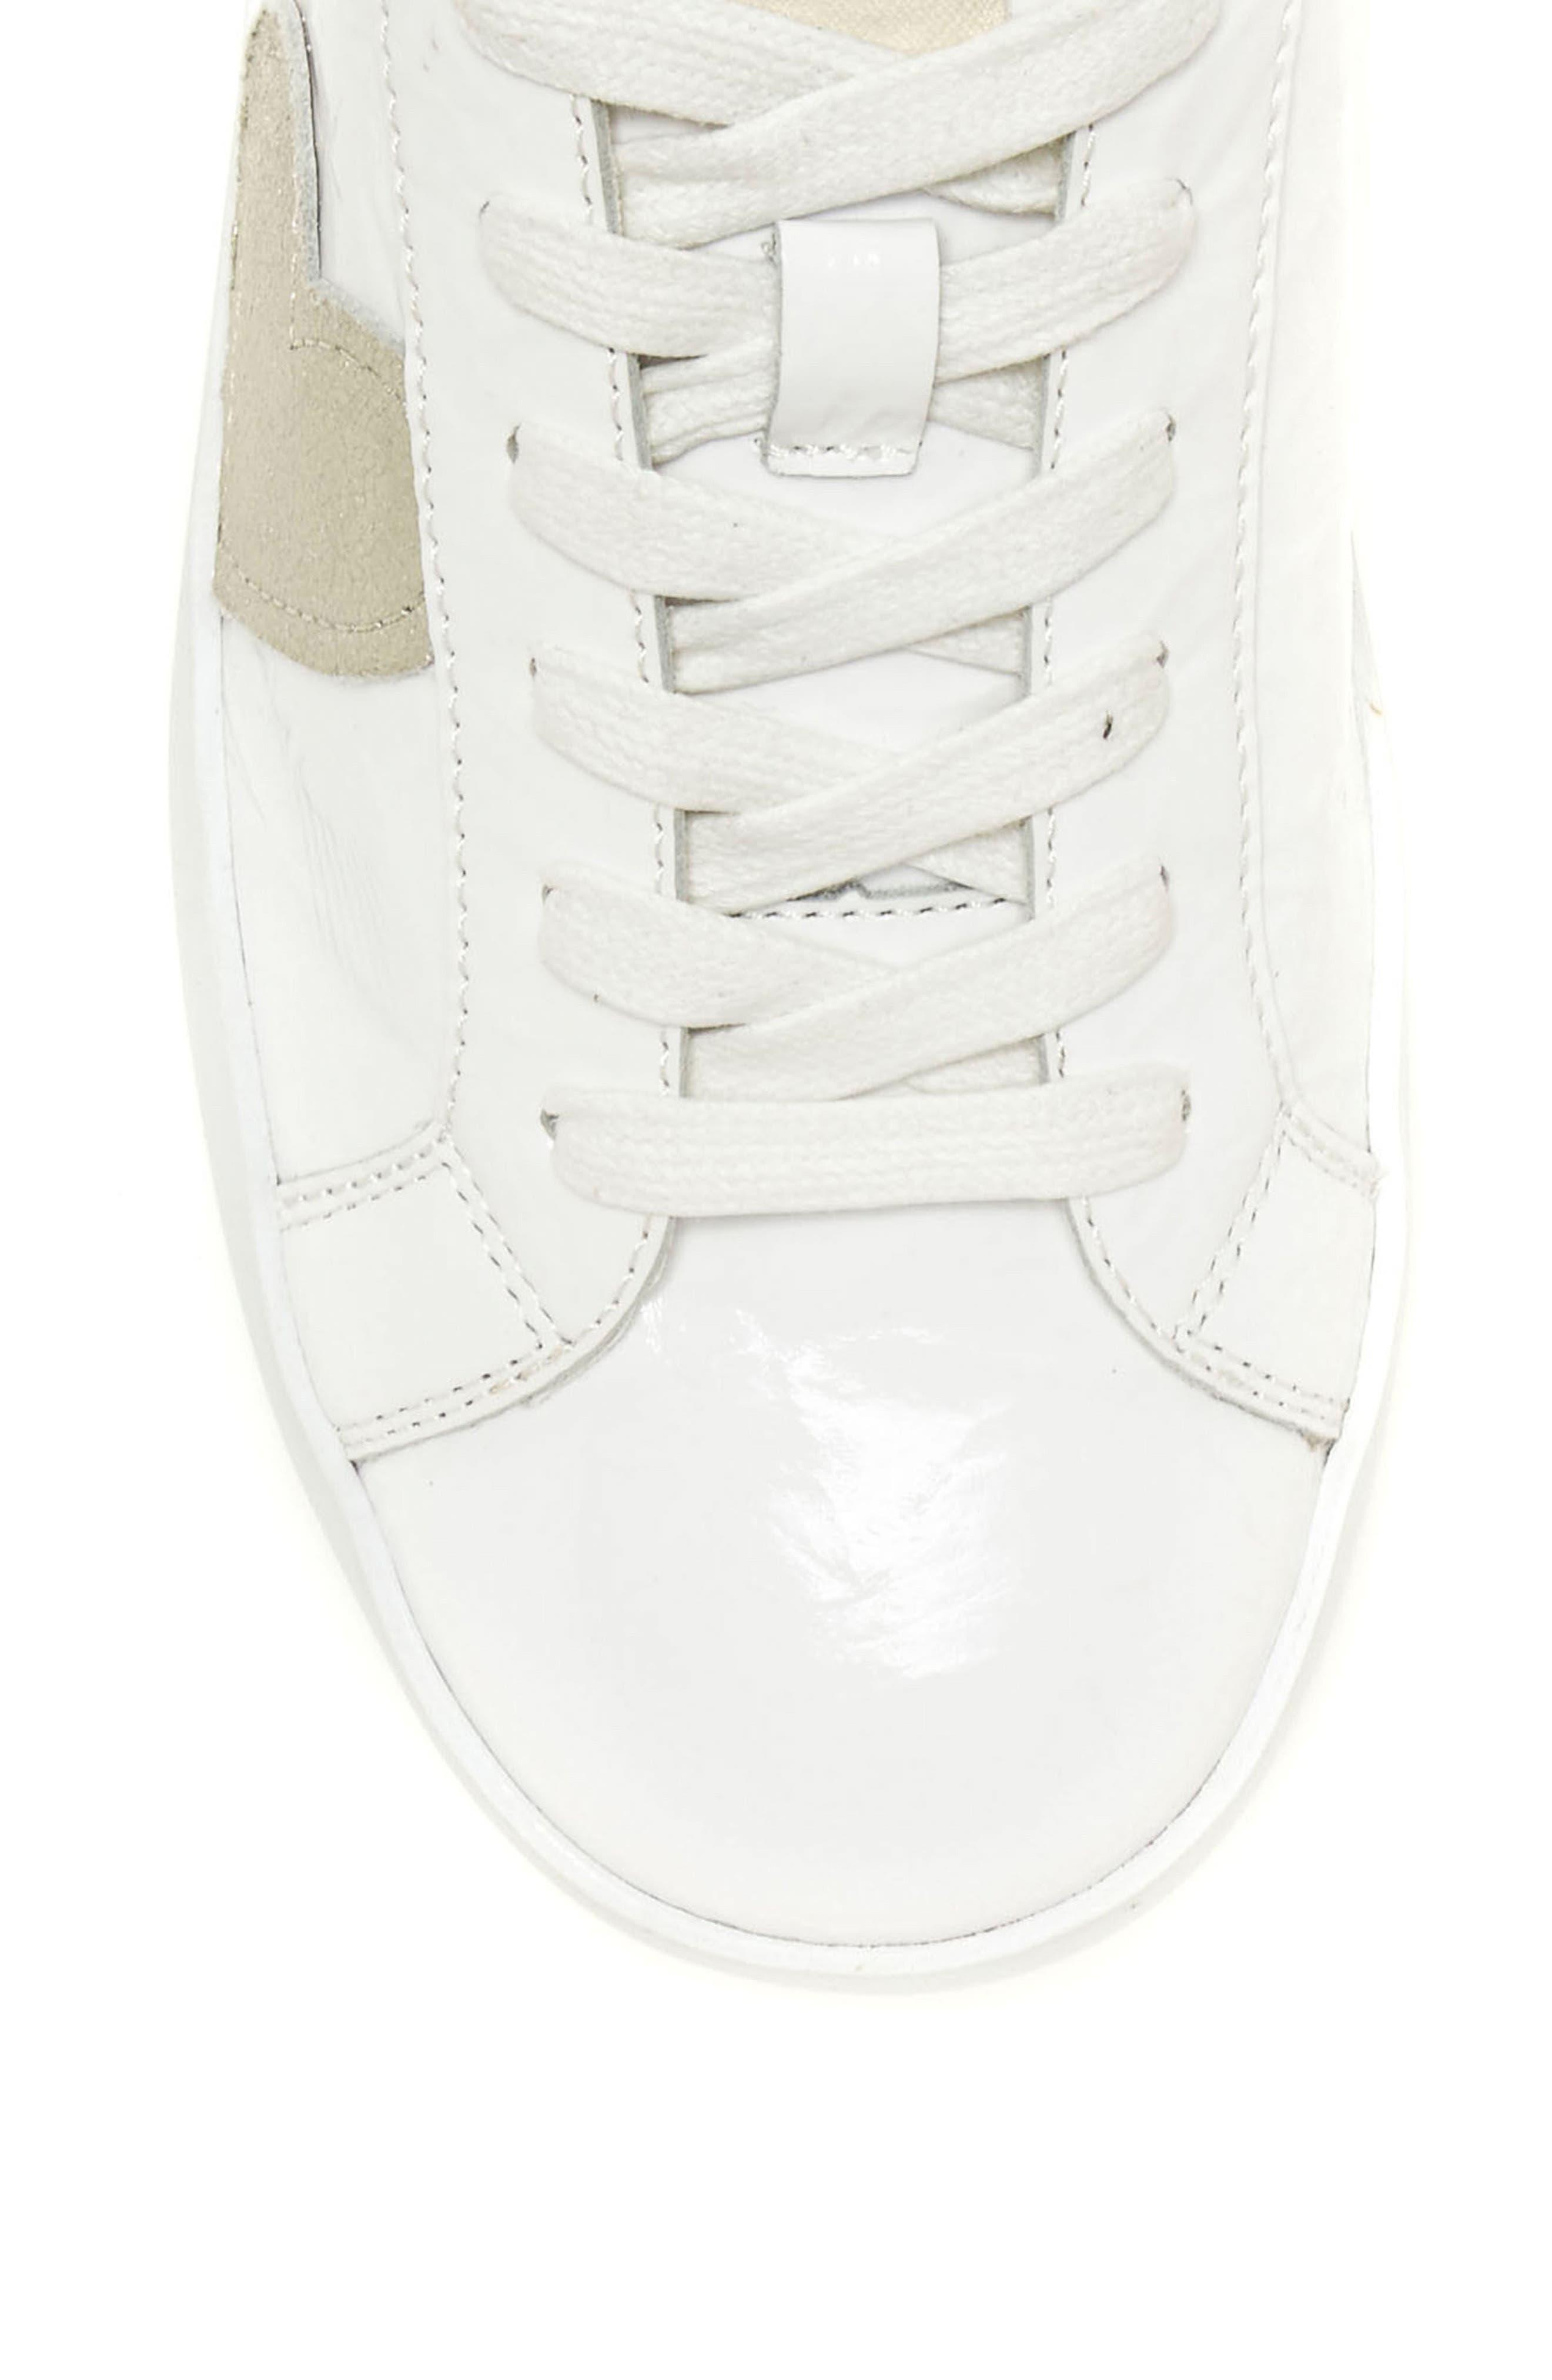 Gillen Sneaker,                             Alternate thumbnail 5, color,                             Pure White Crinkled Patent